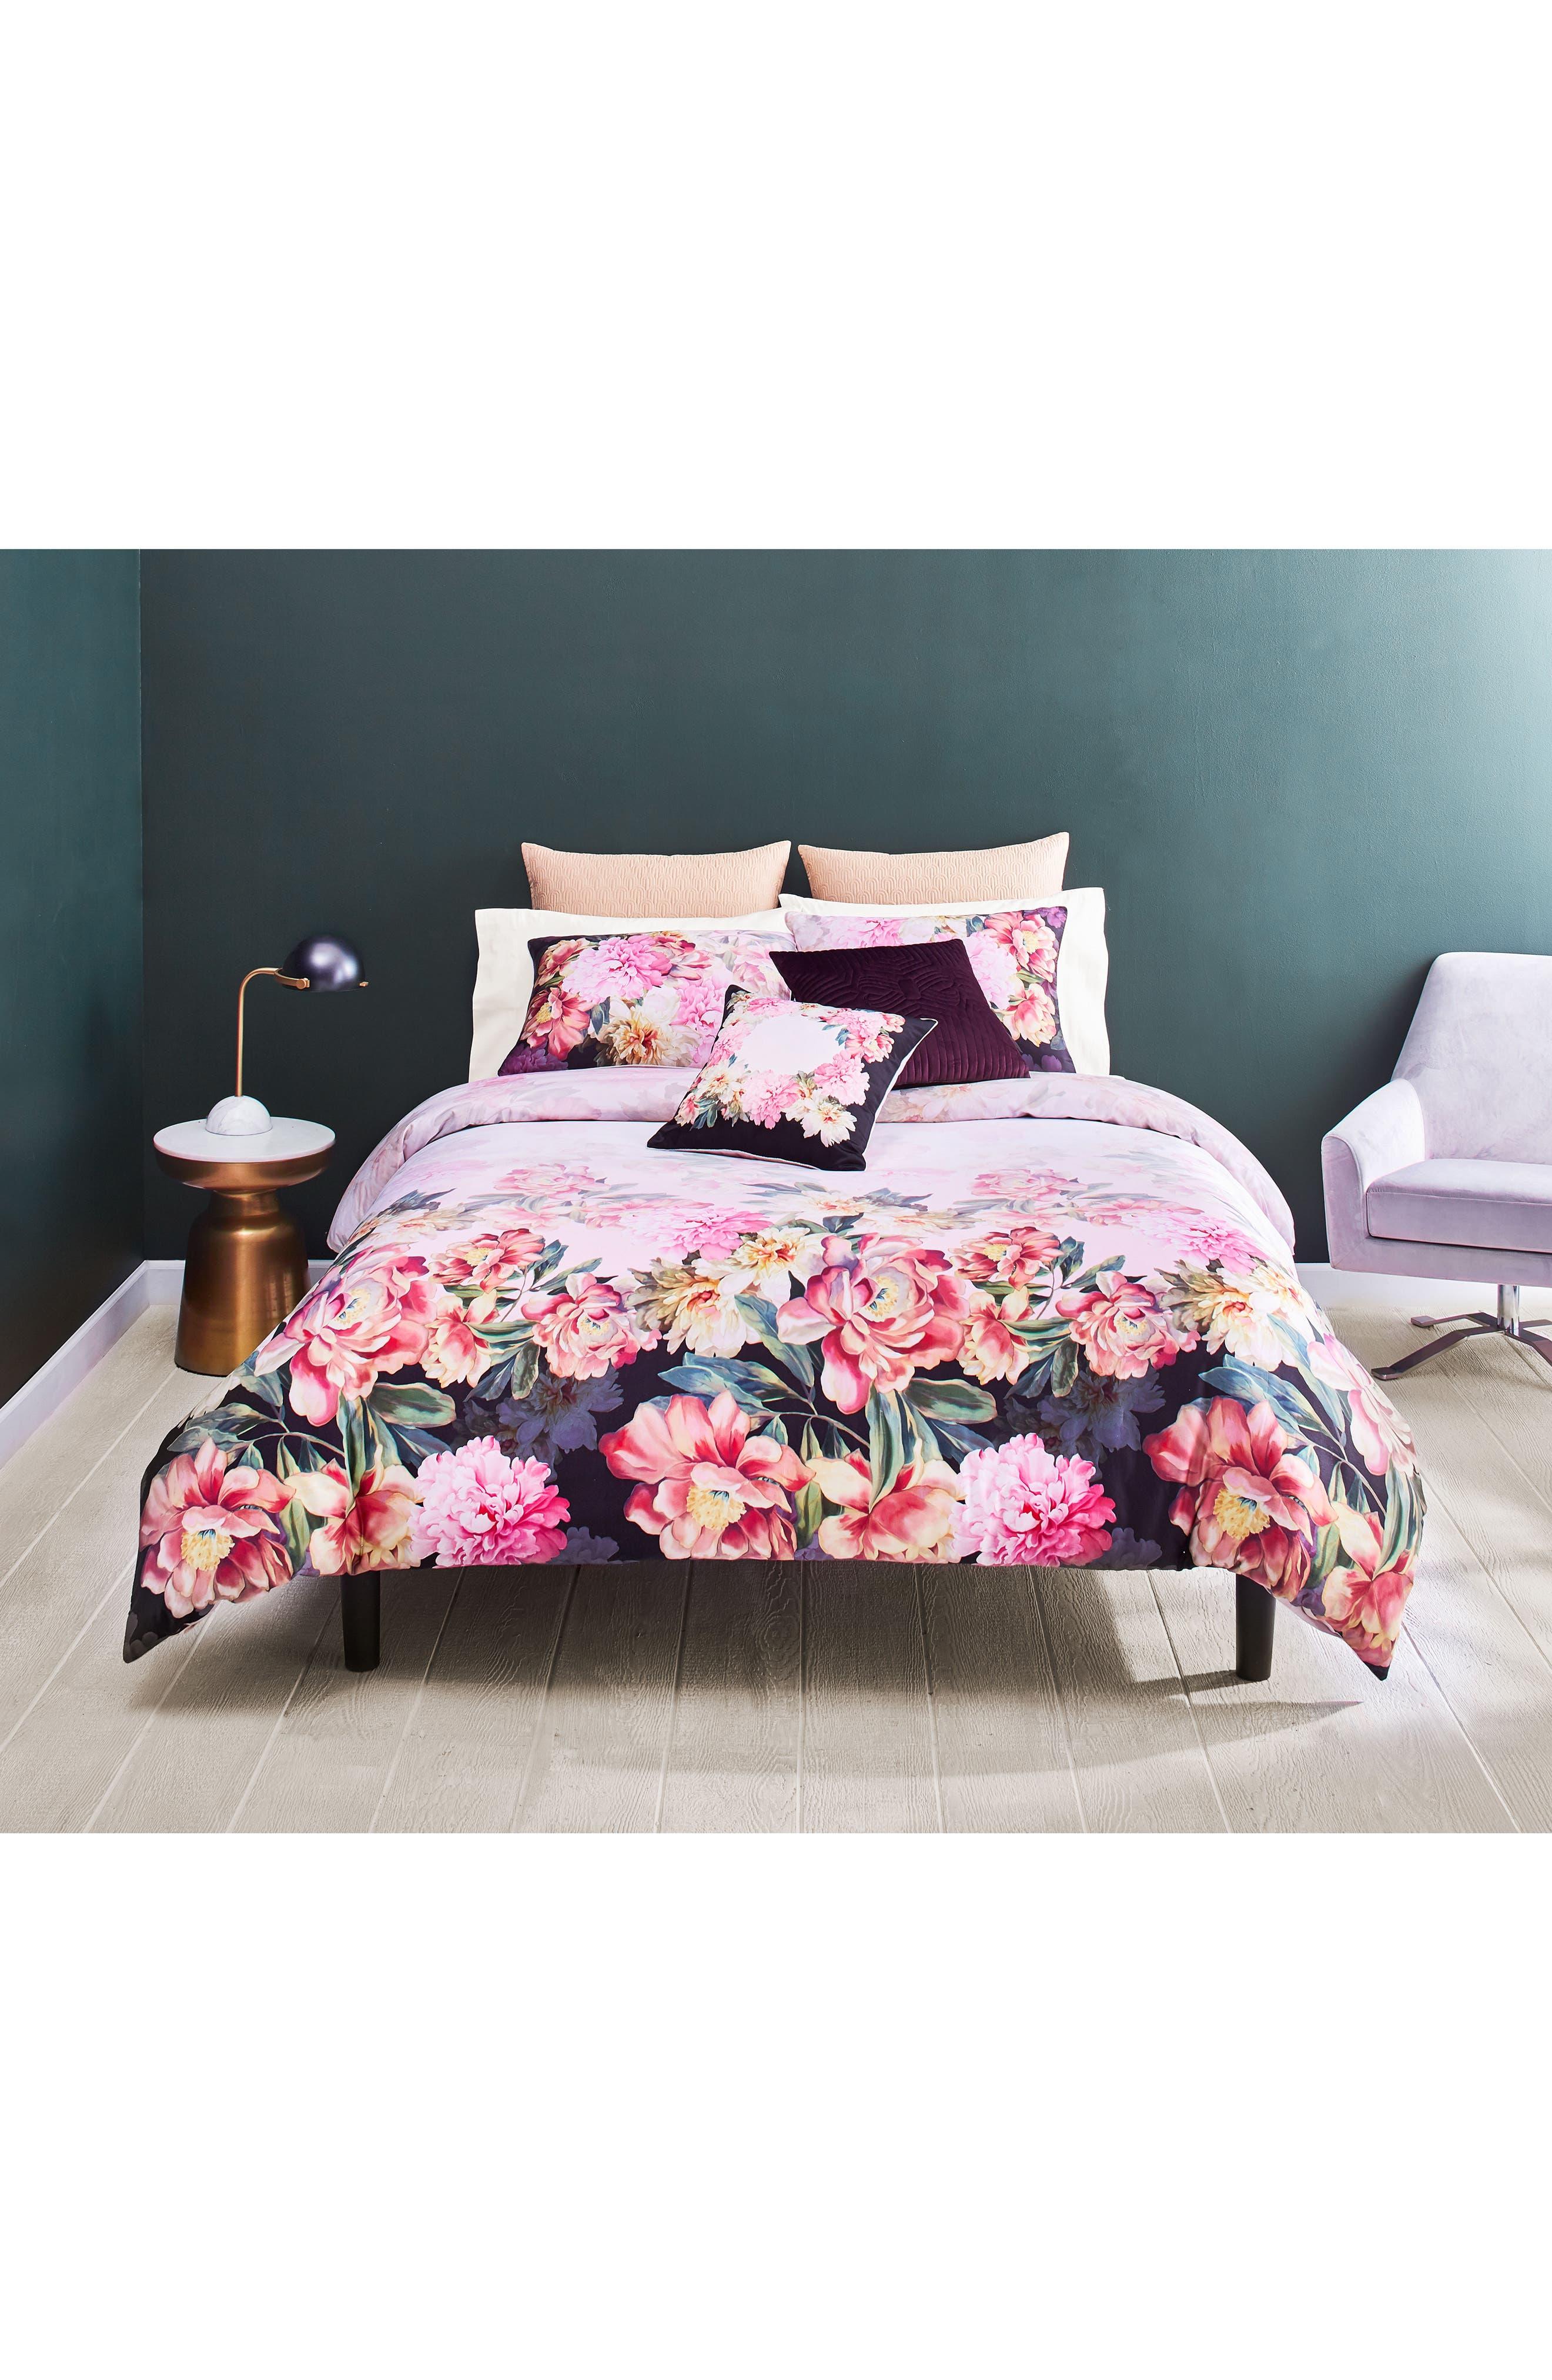 Painted Posie Duvet Cover & Sham Set,                         Main,                         color, Pink/ Multi